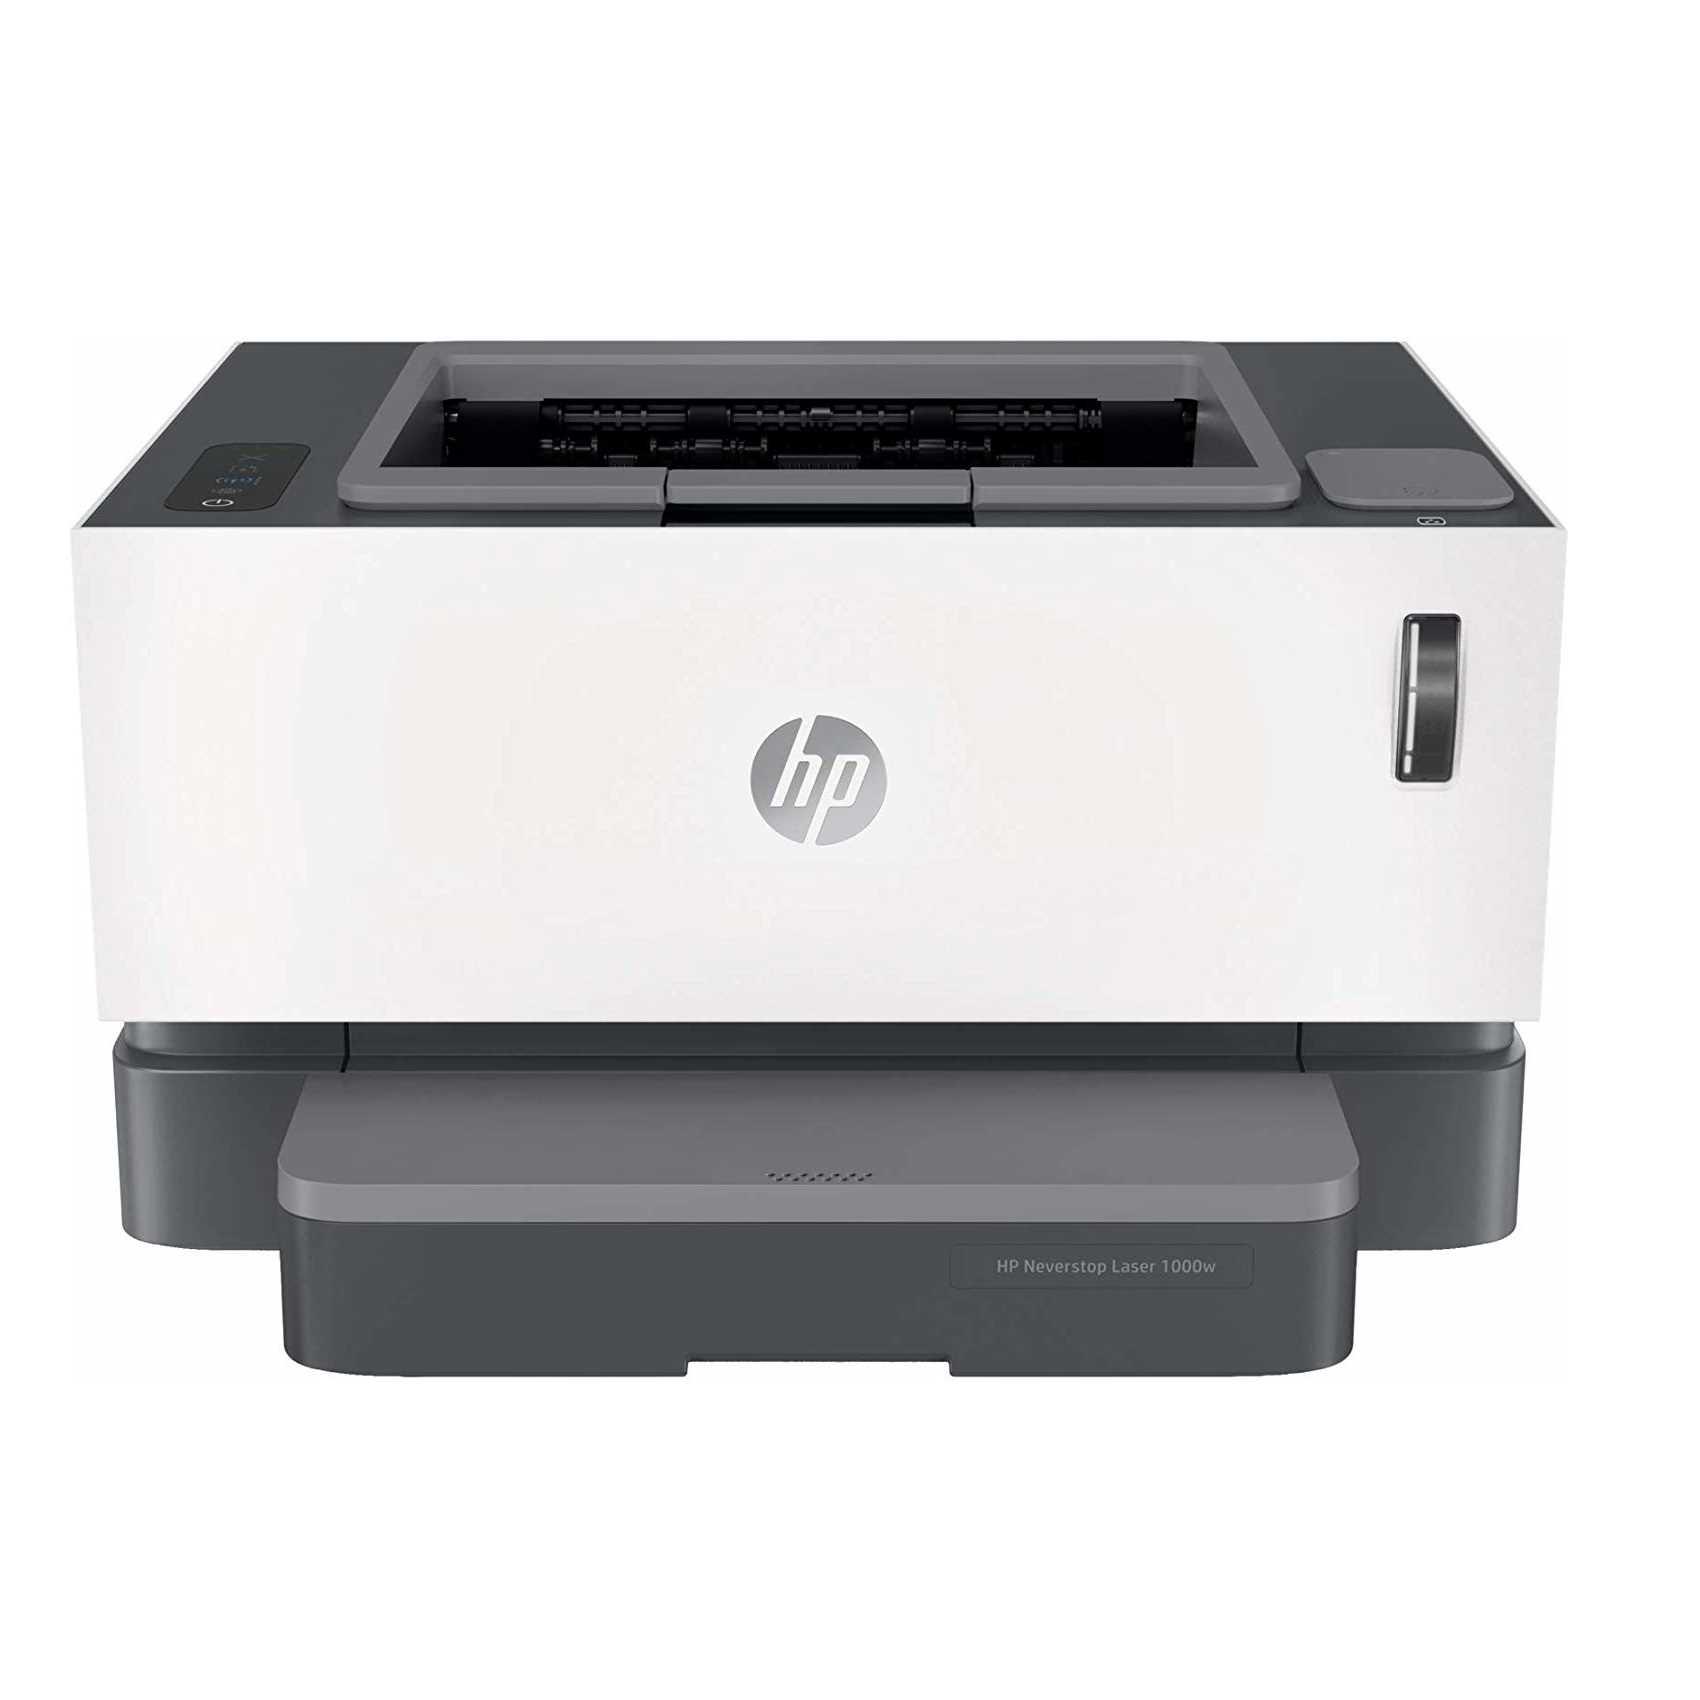 HP Neverstop Laser 1000W Multifunction Printer